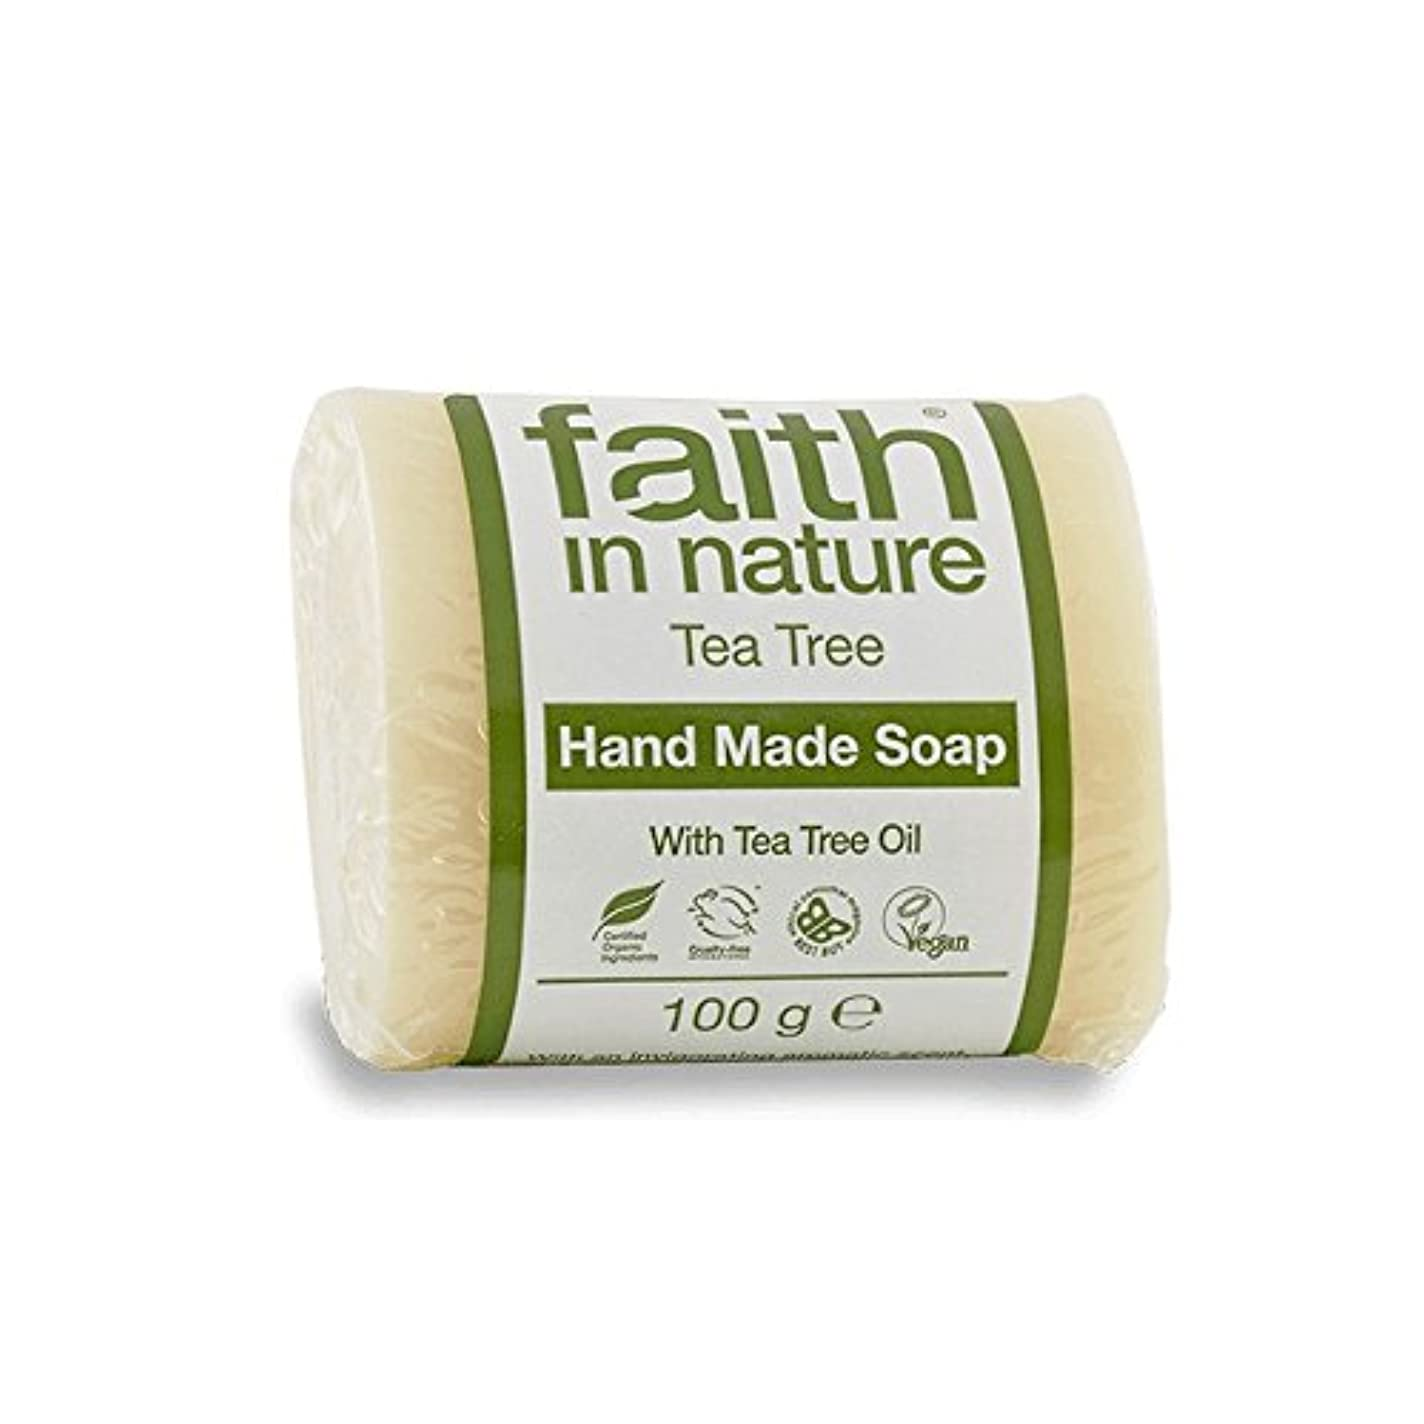 Faith in Nature Tea Tree Soap 100g (Pack of 2) - 自然のティーツリーソープ100グラムの信仰 (x2) [並行輸入品]